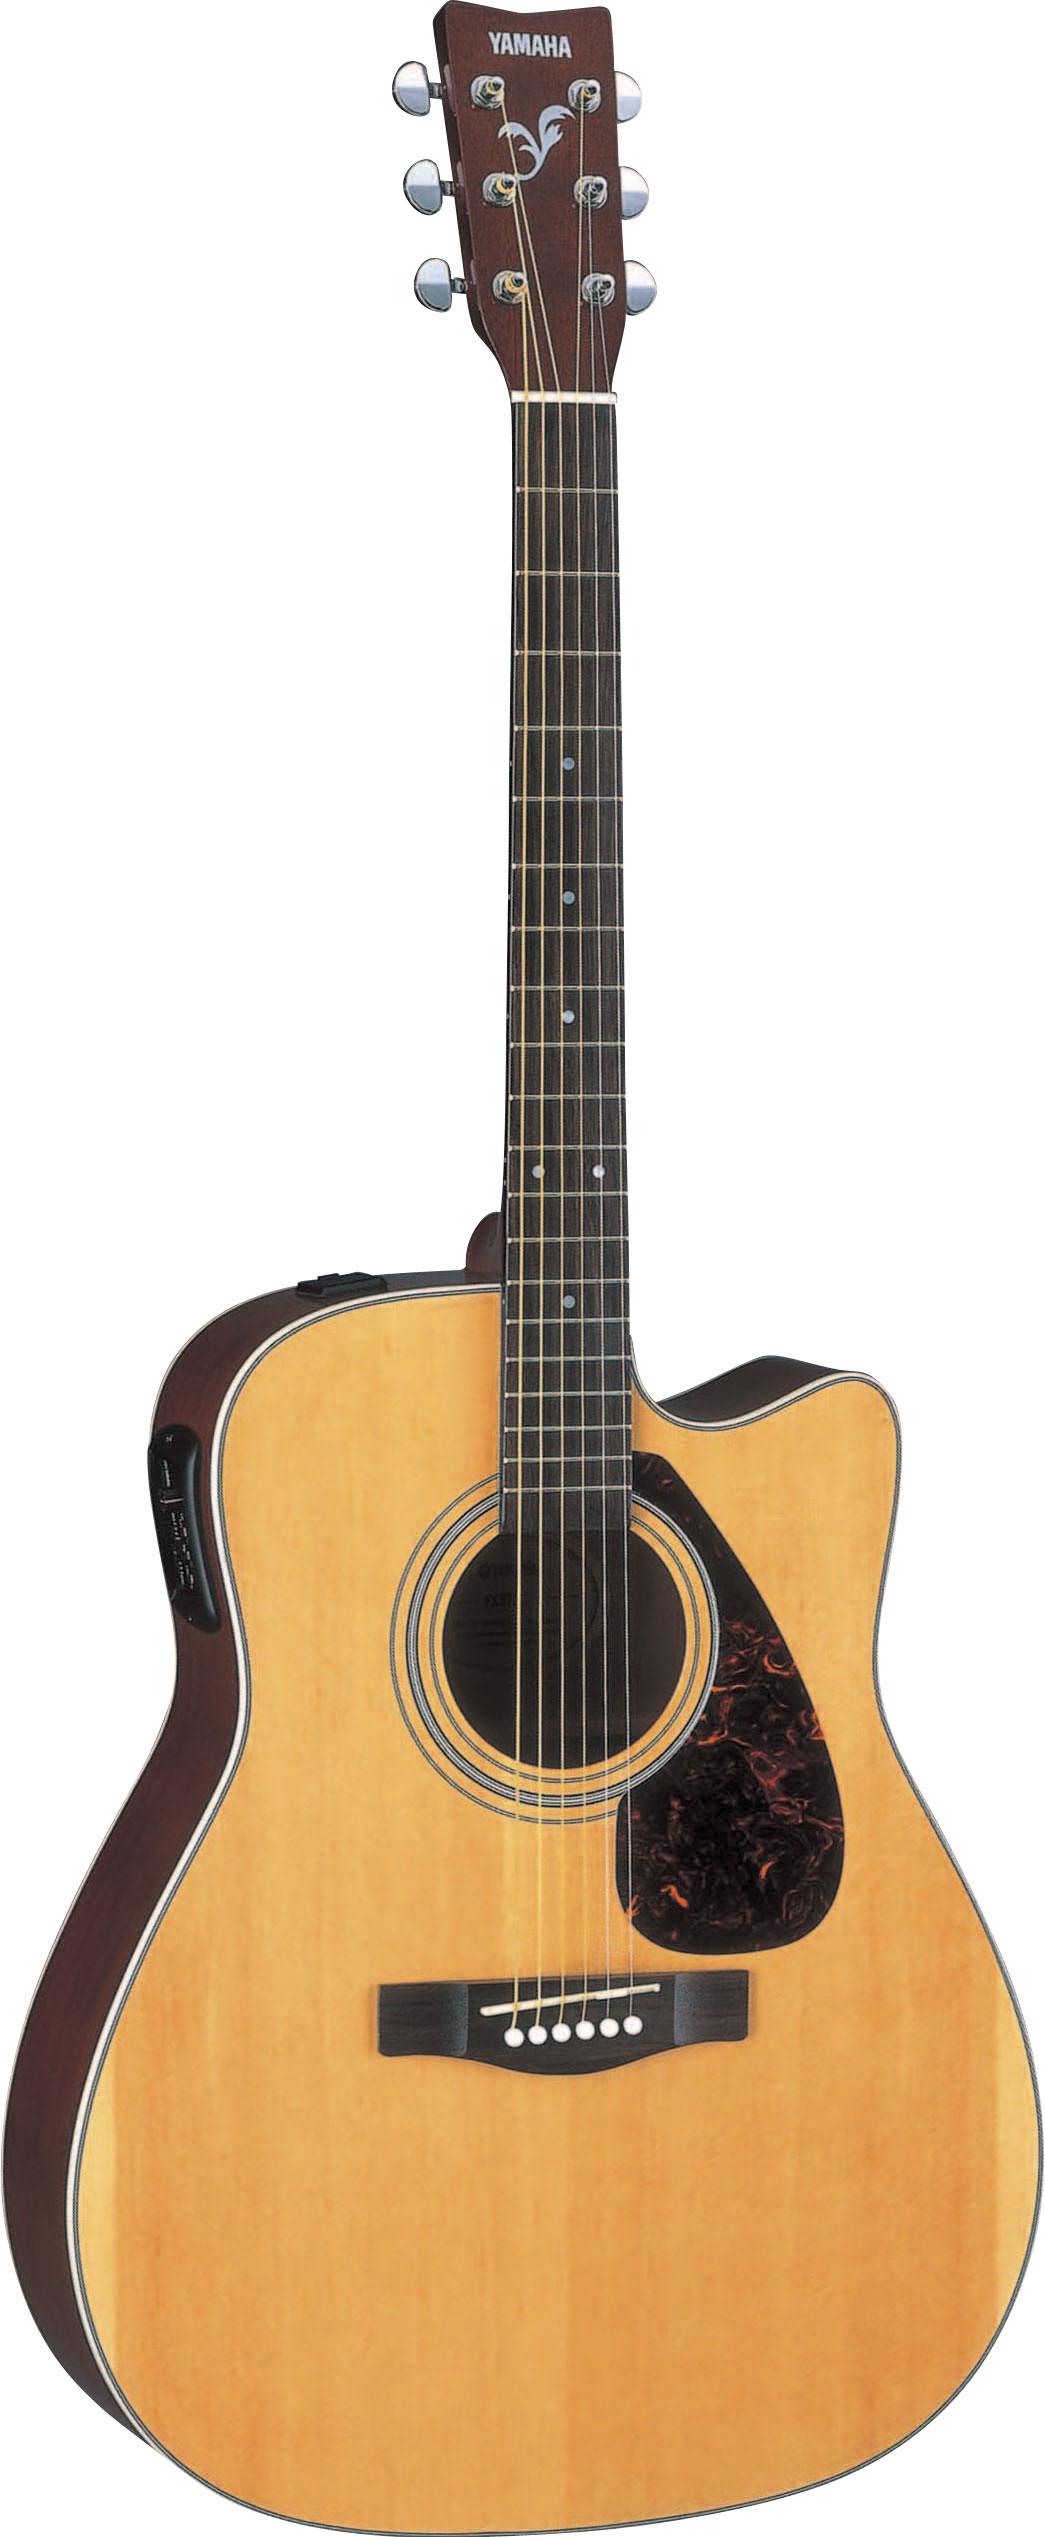 Acoustic guitar Yamaha FX370C